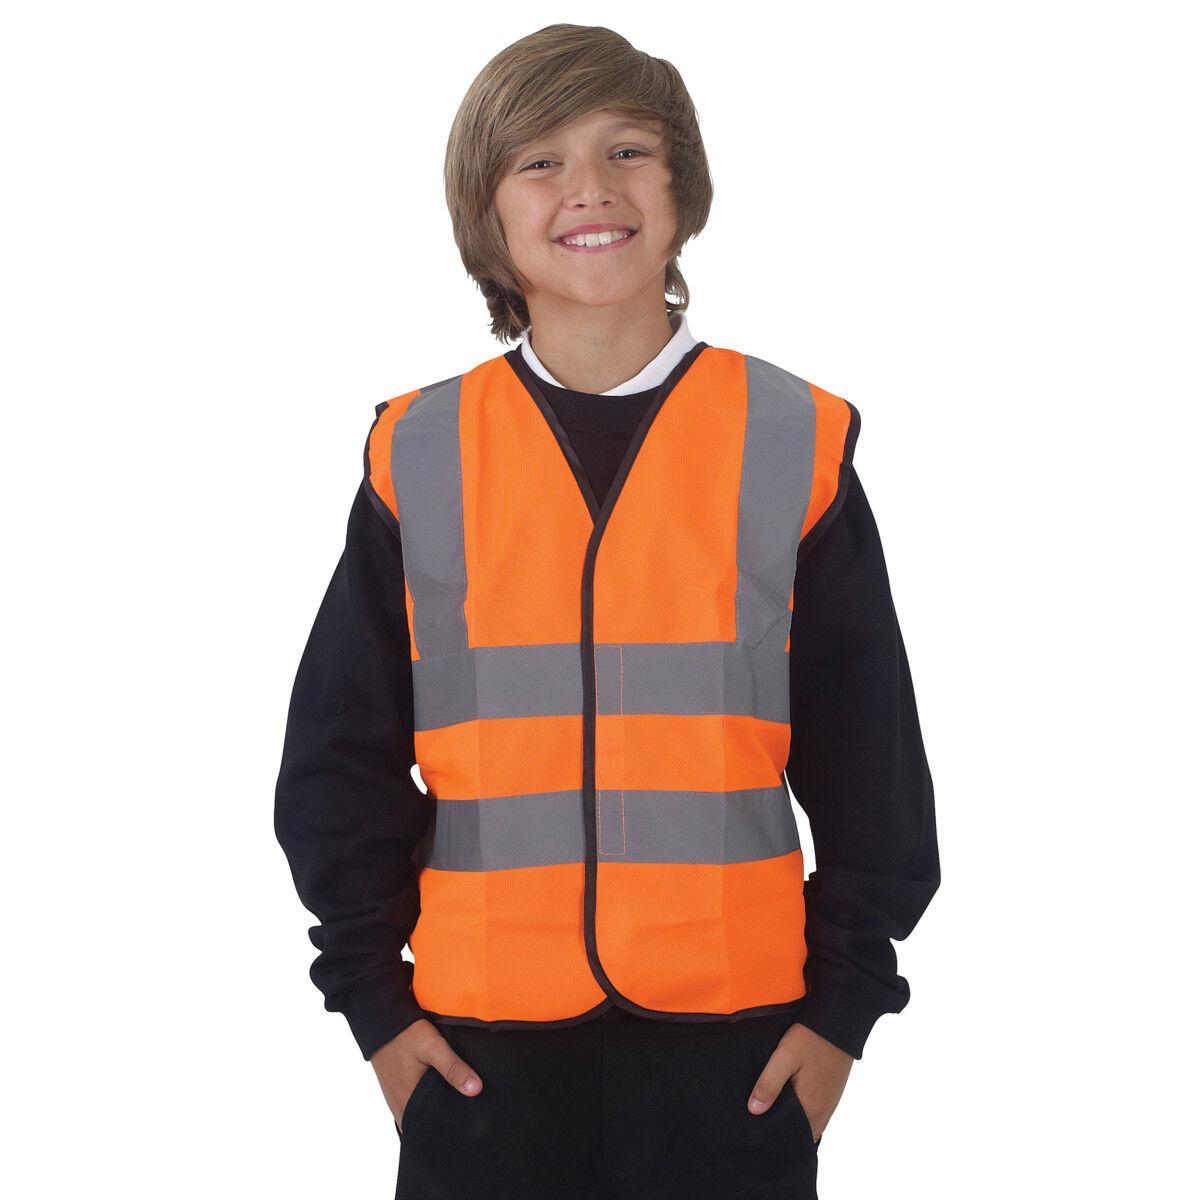 Childrens High Visibility Waistcoat